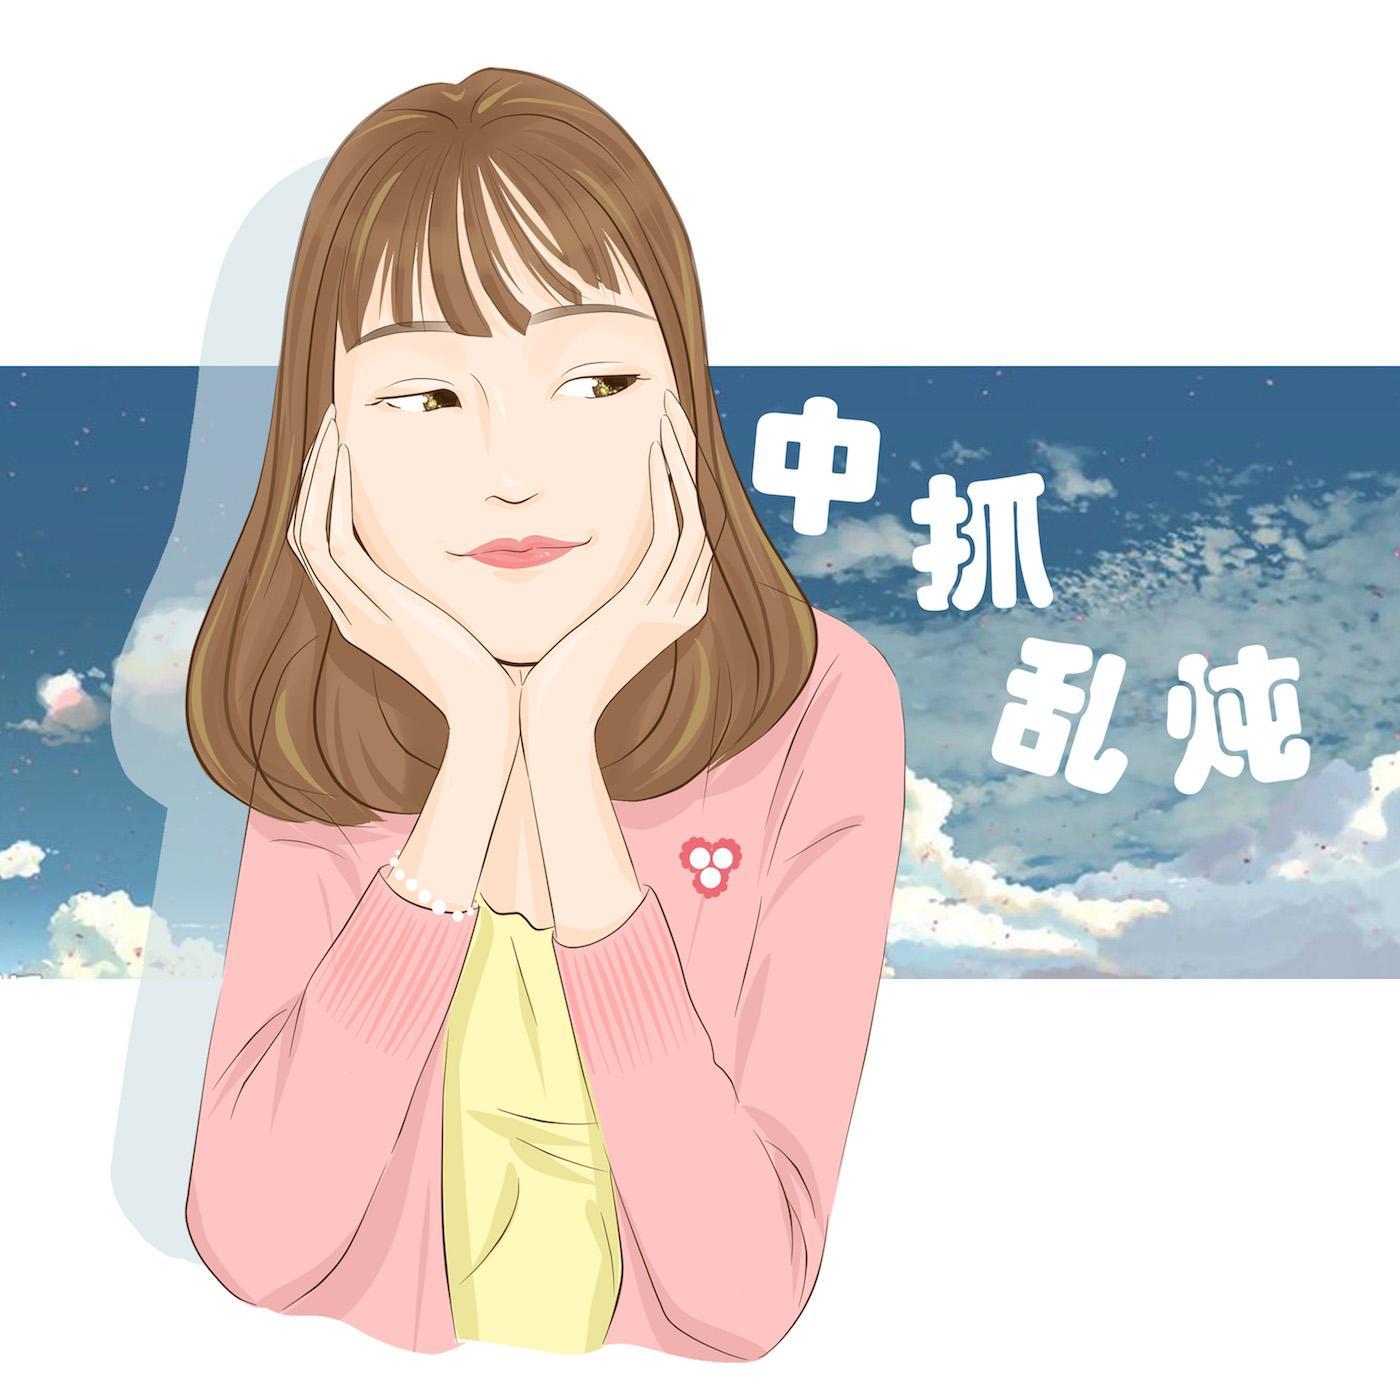 <![CDATA[中抓乱炖]]>